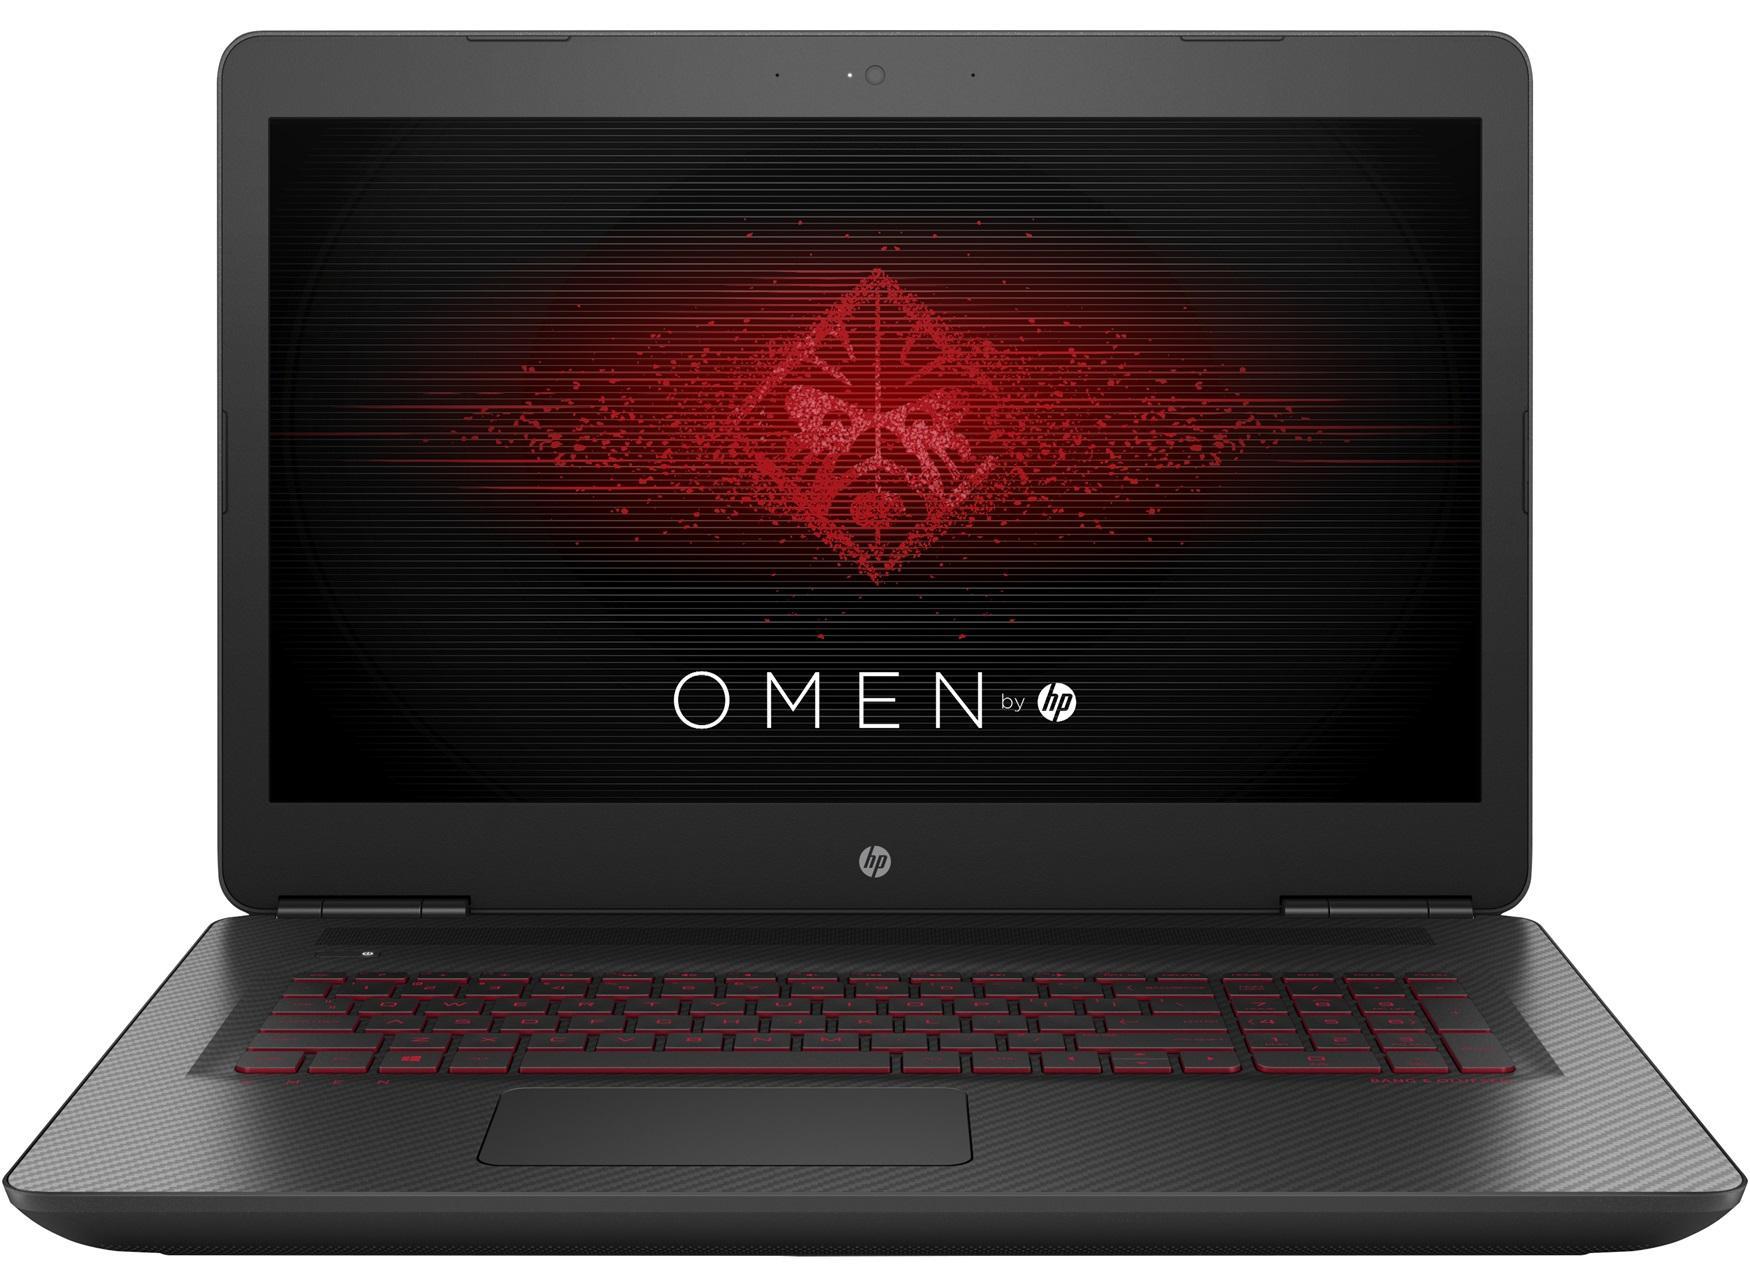 "PC Portable 17"" HP Omen 17-w025nf - Full HD, i5, RAM 8 Go, HDD 1 To + SSD 128 Go, GTX 960M"